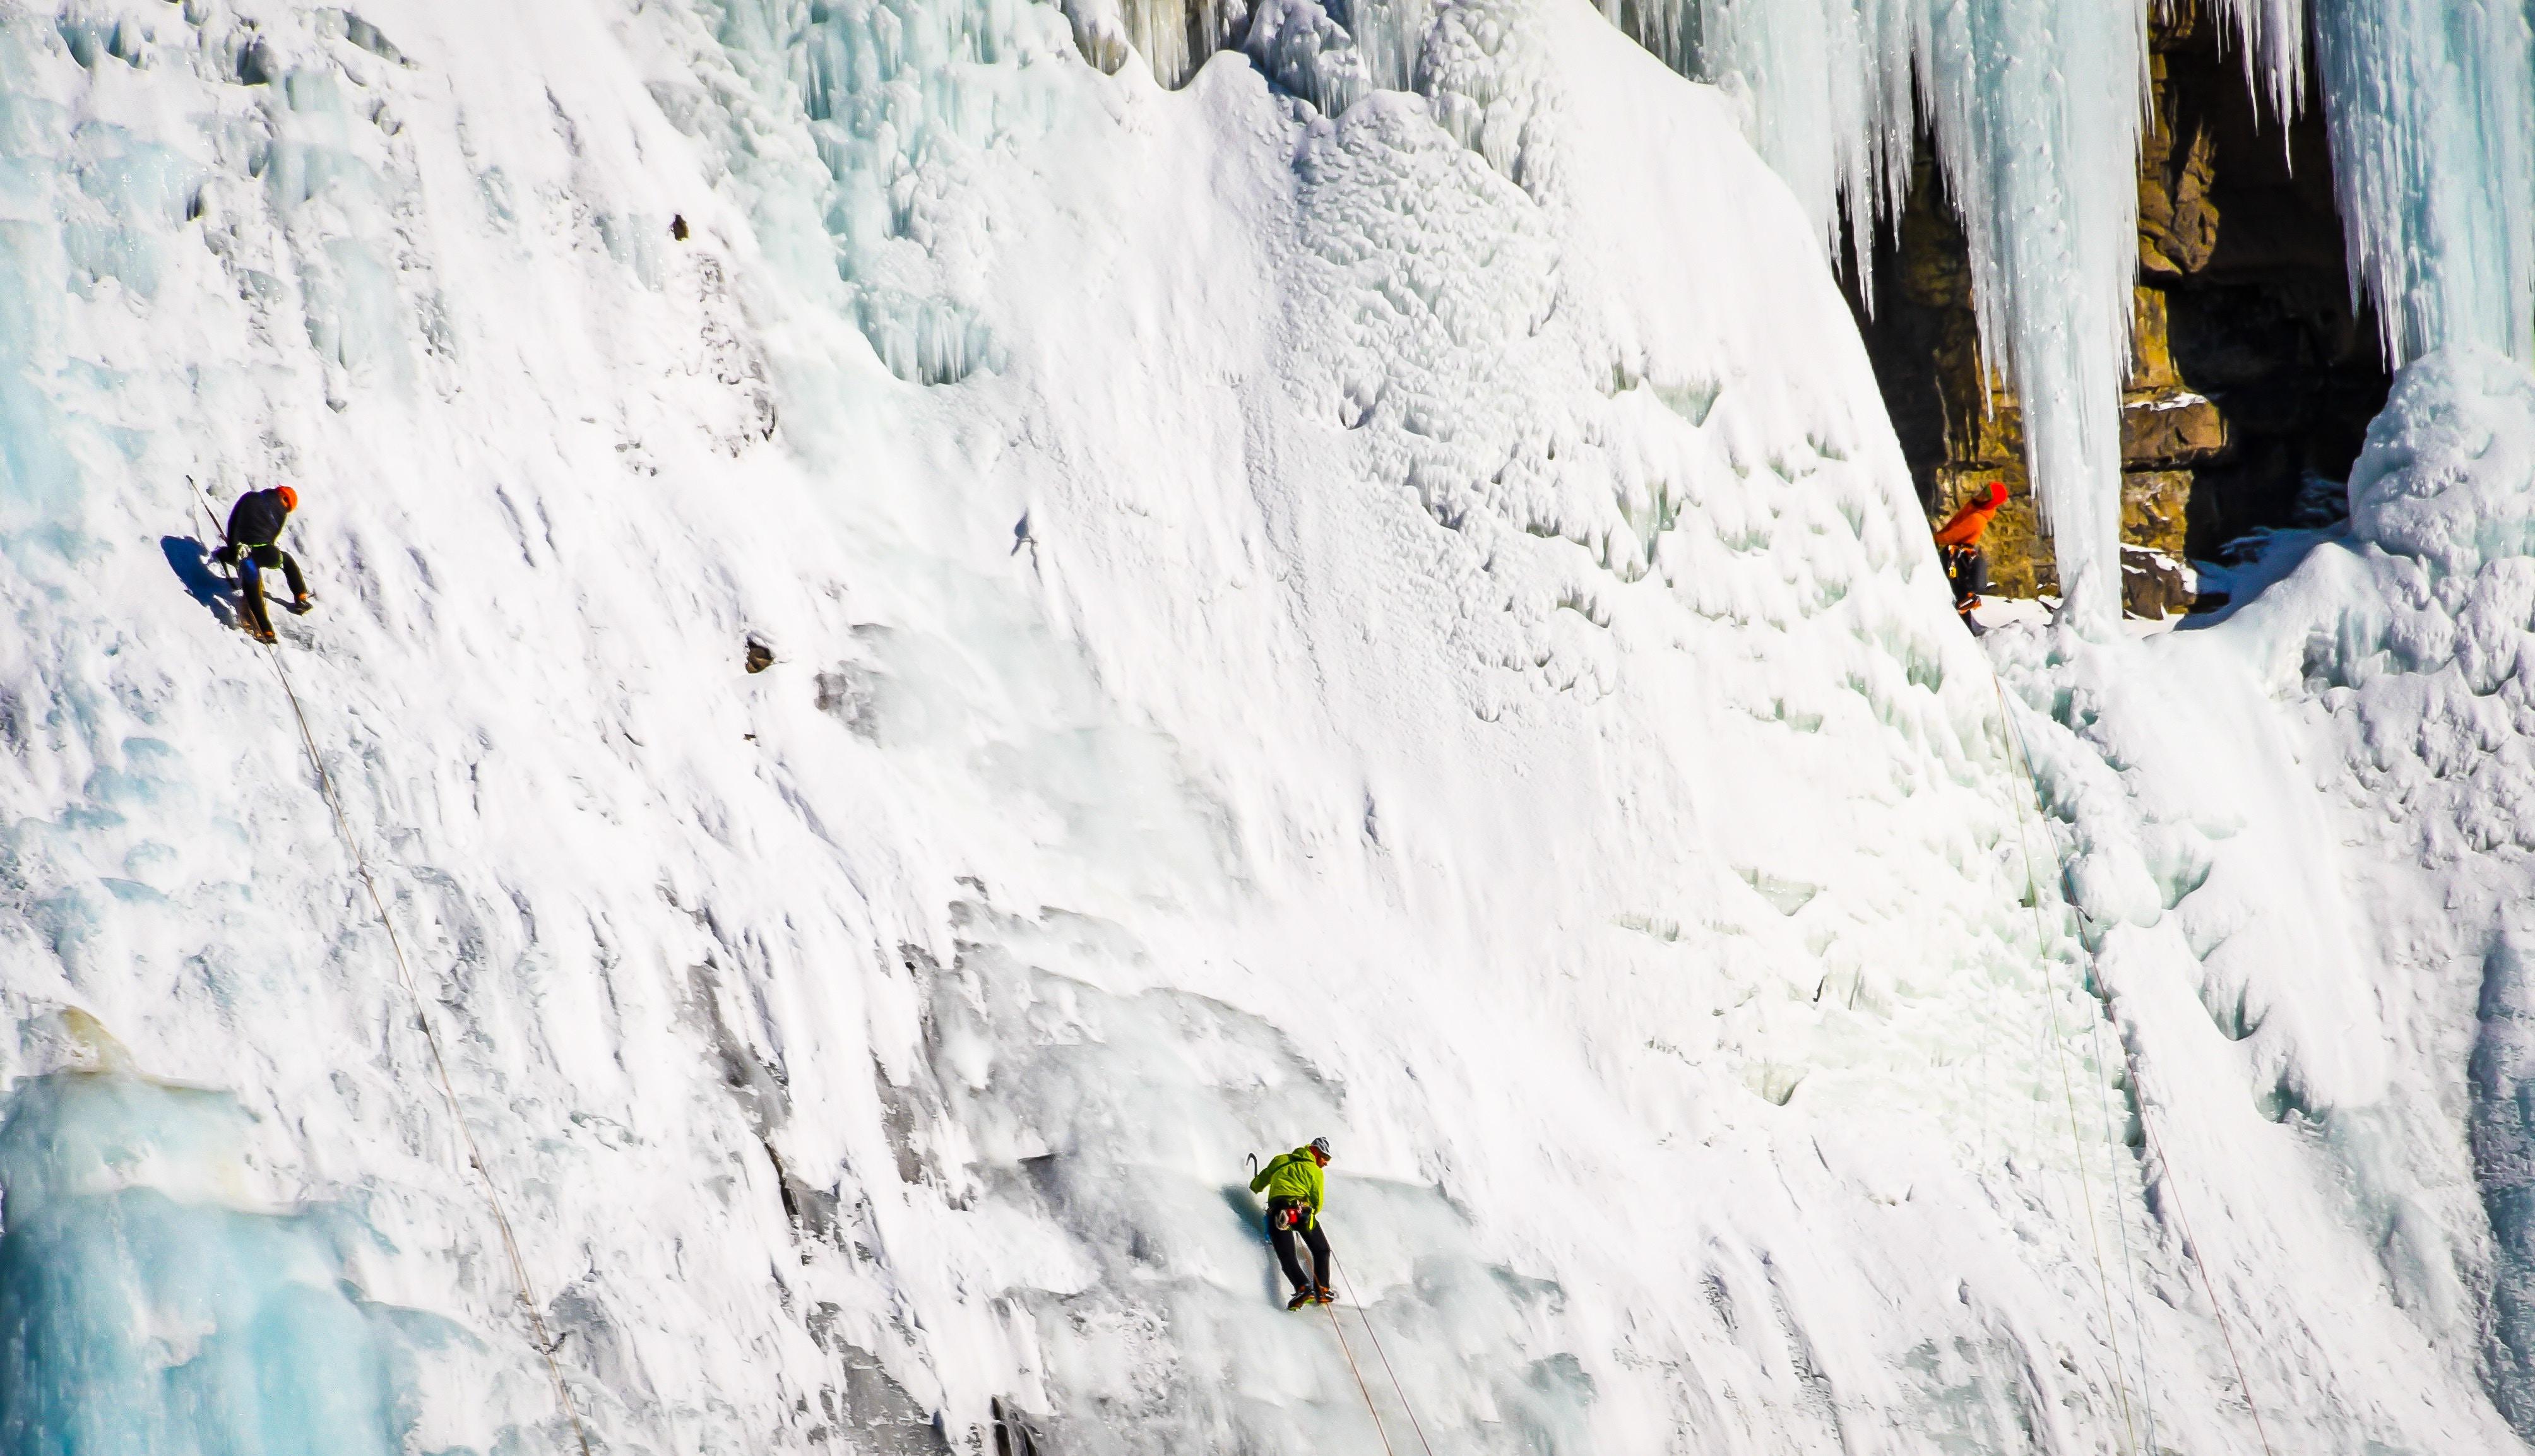 Three Climbers Ice Climbing